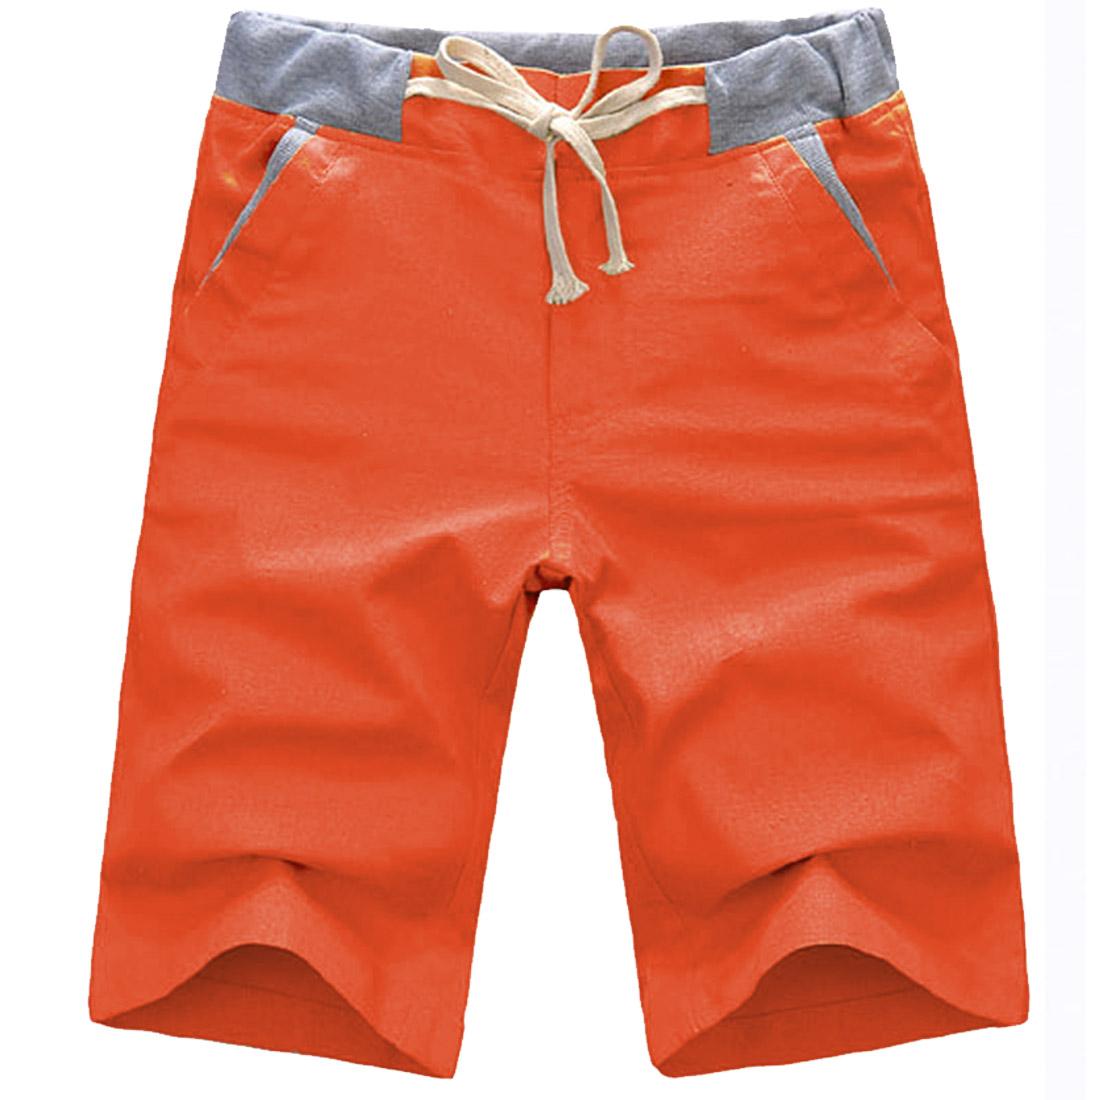 Man Slant Pockets Linen Leisure Buttoned Chic Shorts Orange W31